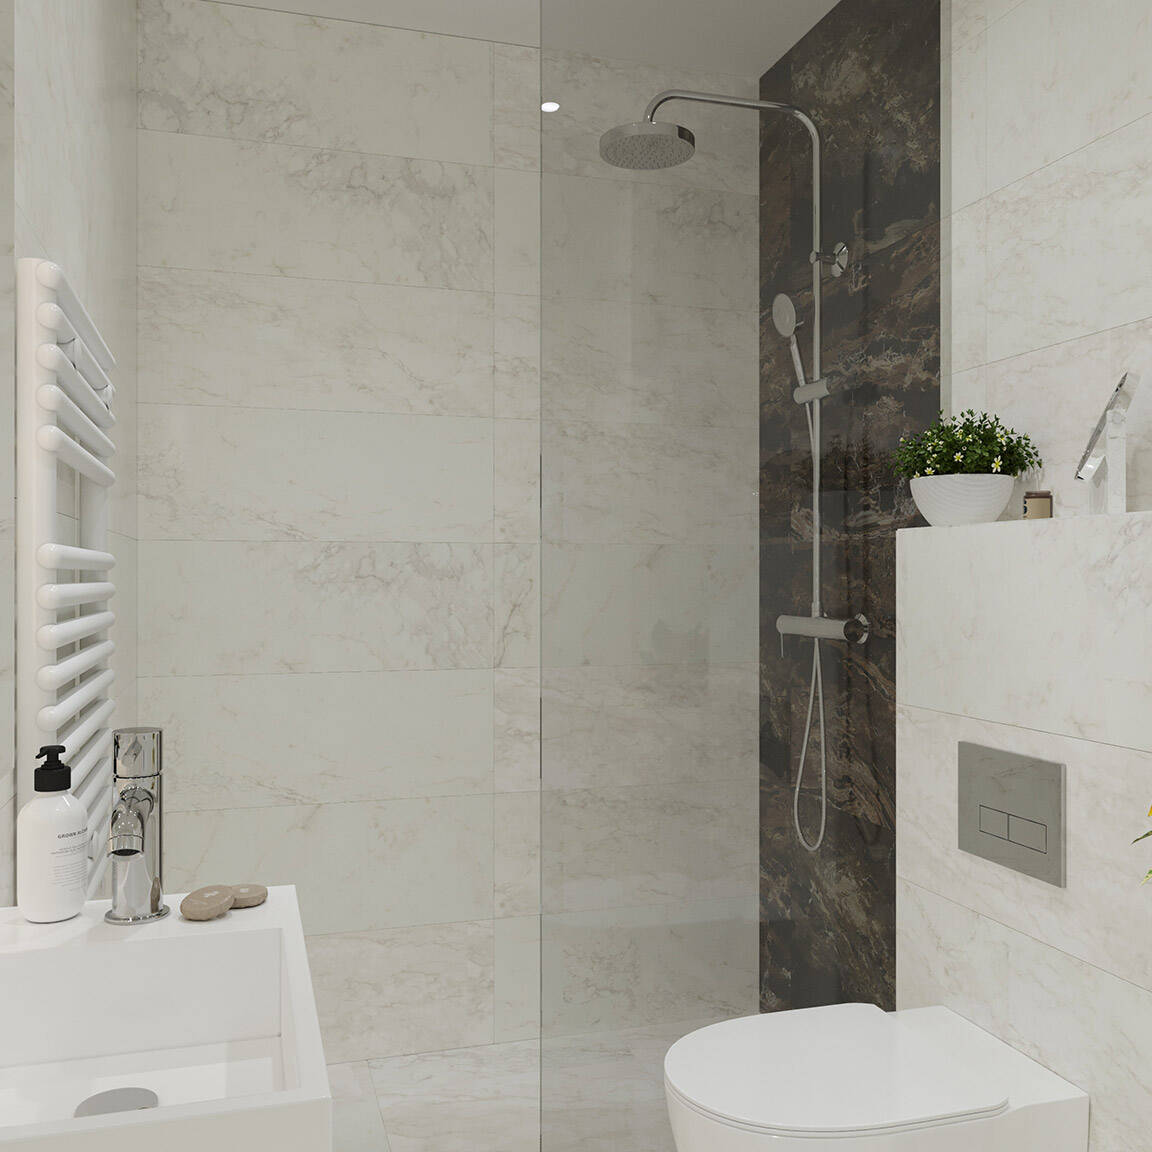 Catedral Residence - Bathroom - Marazzi Ceramic tiles - 3